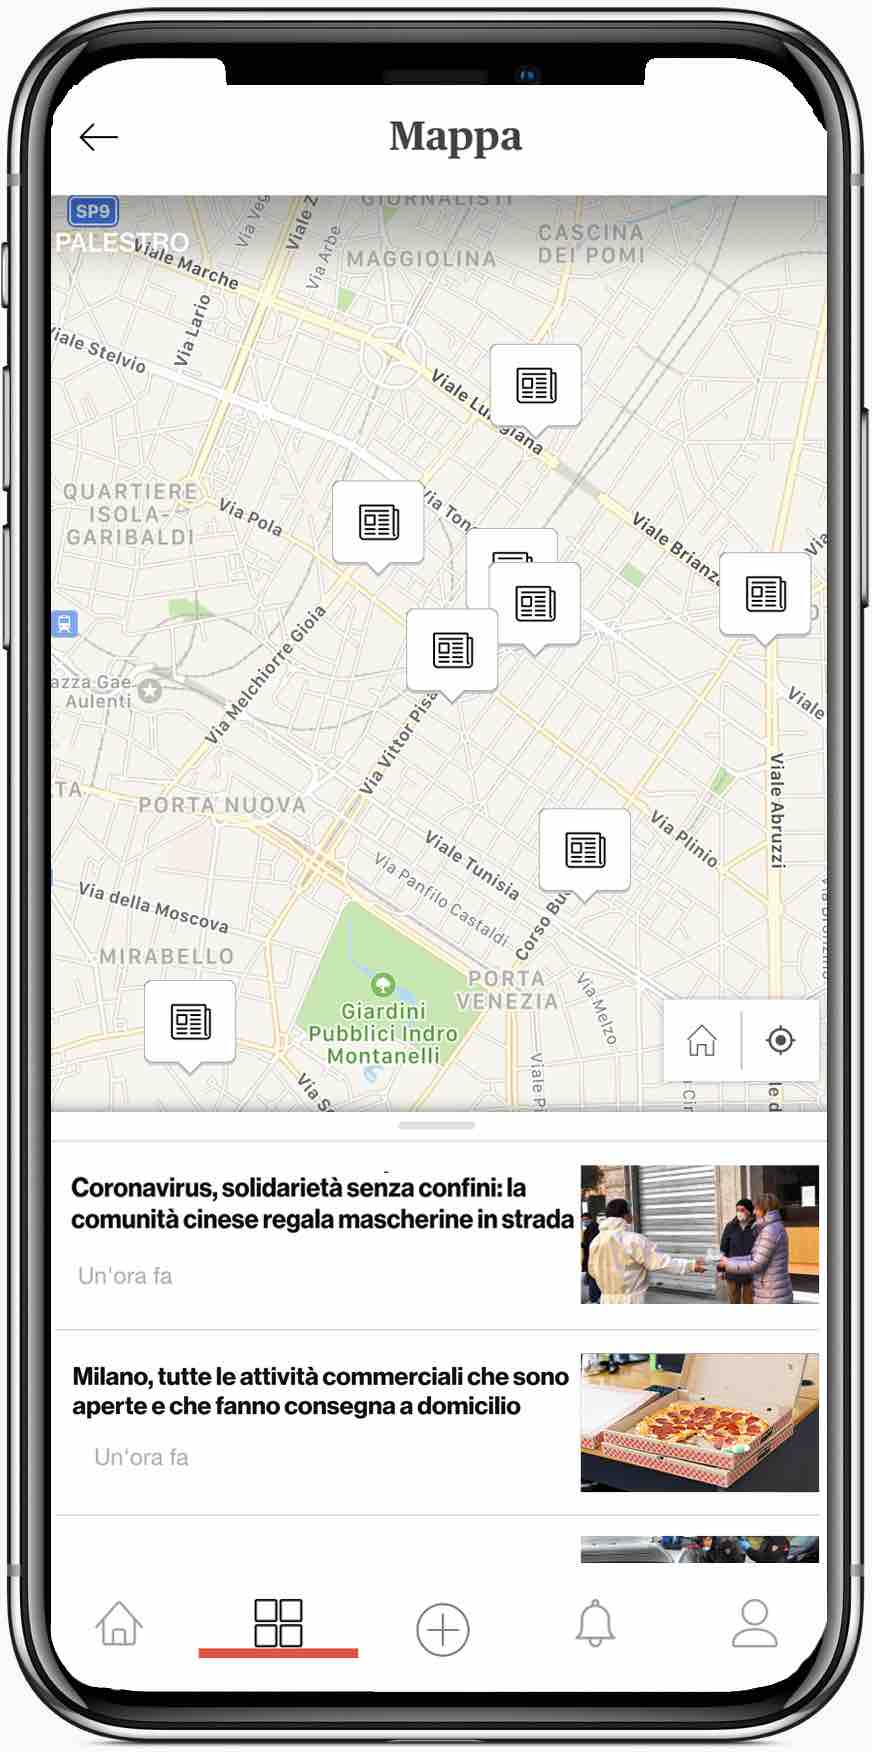 Mappa-MilanoToday2